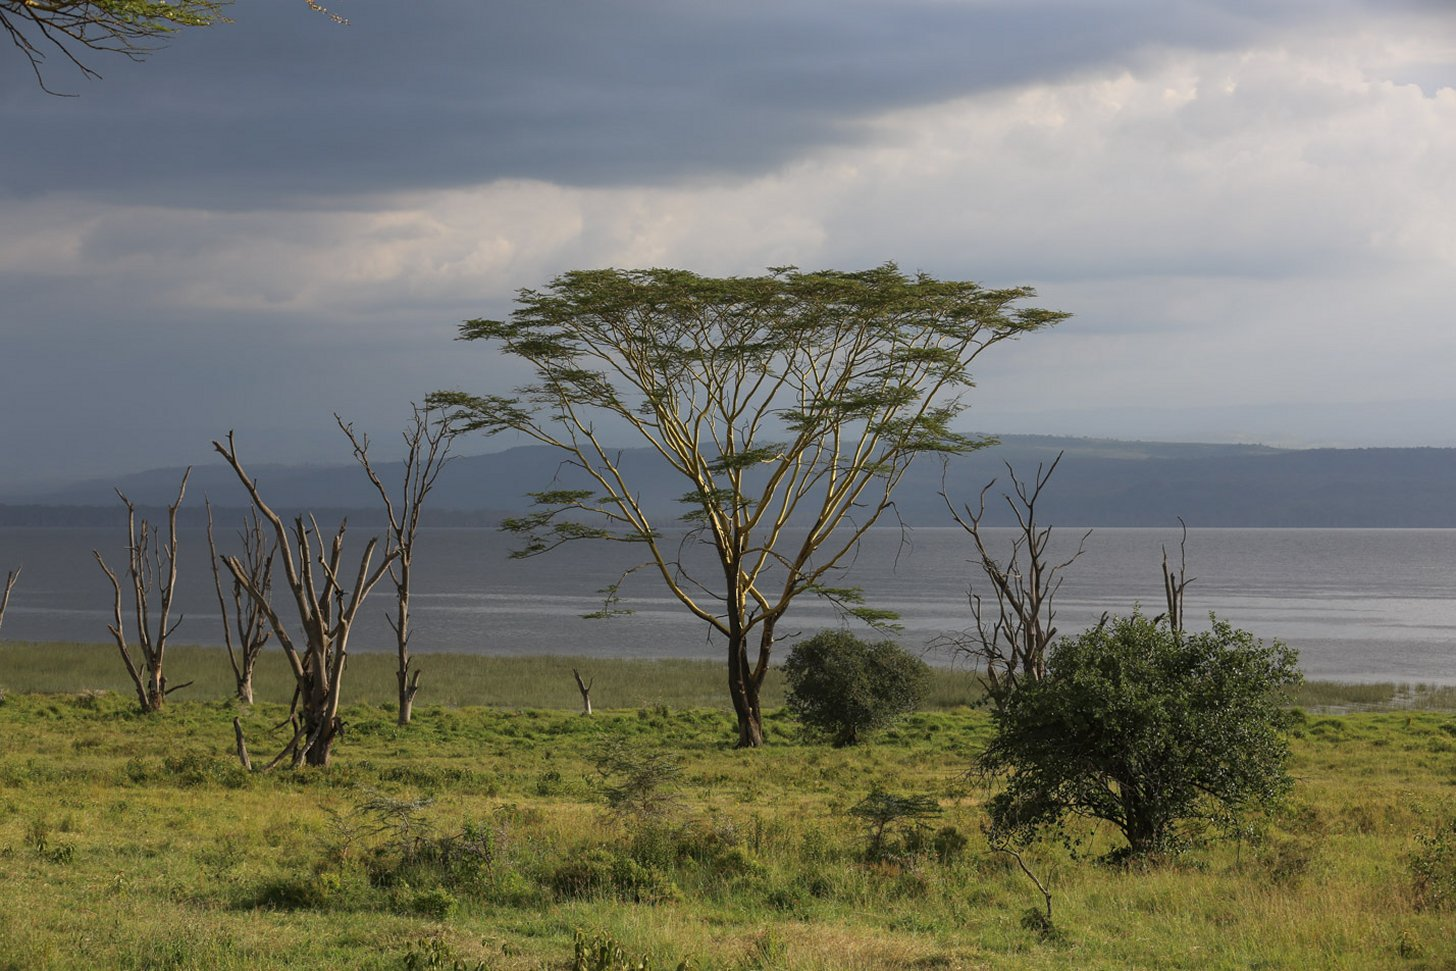 Lake Nakuru National Park is alleen al qua natuur de moeite waard.